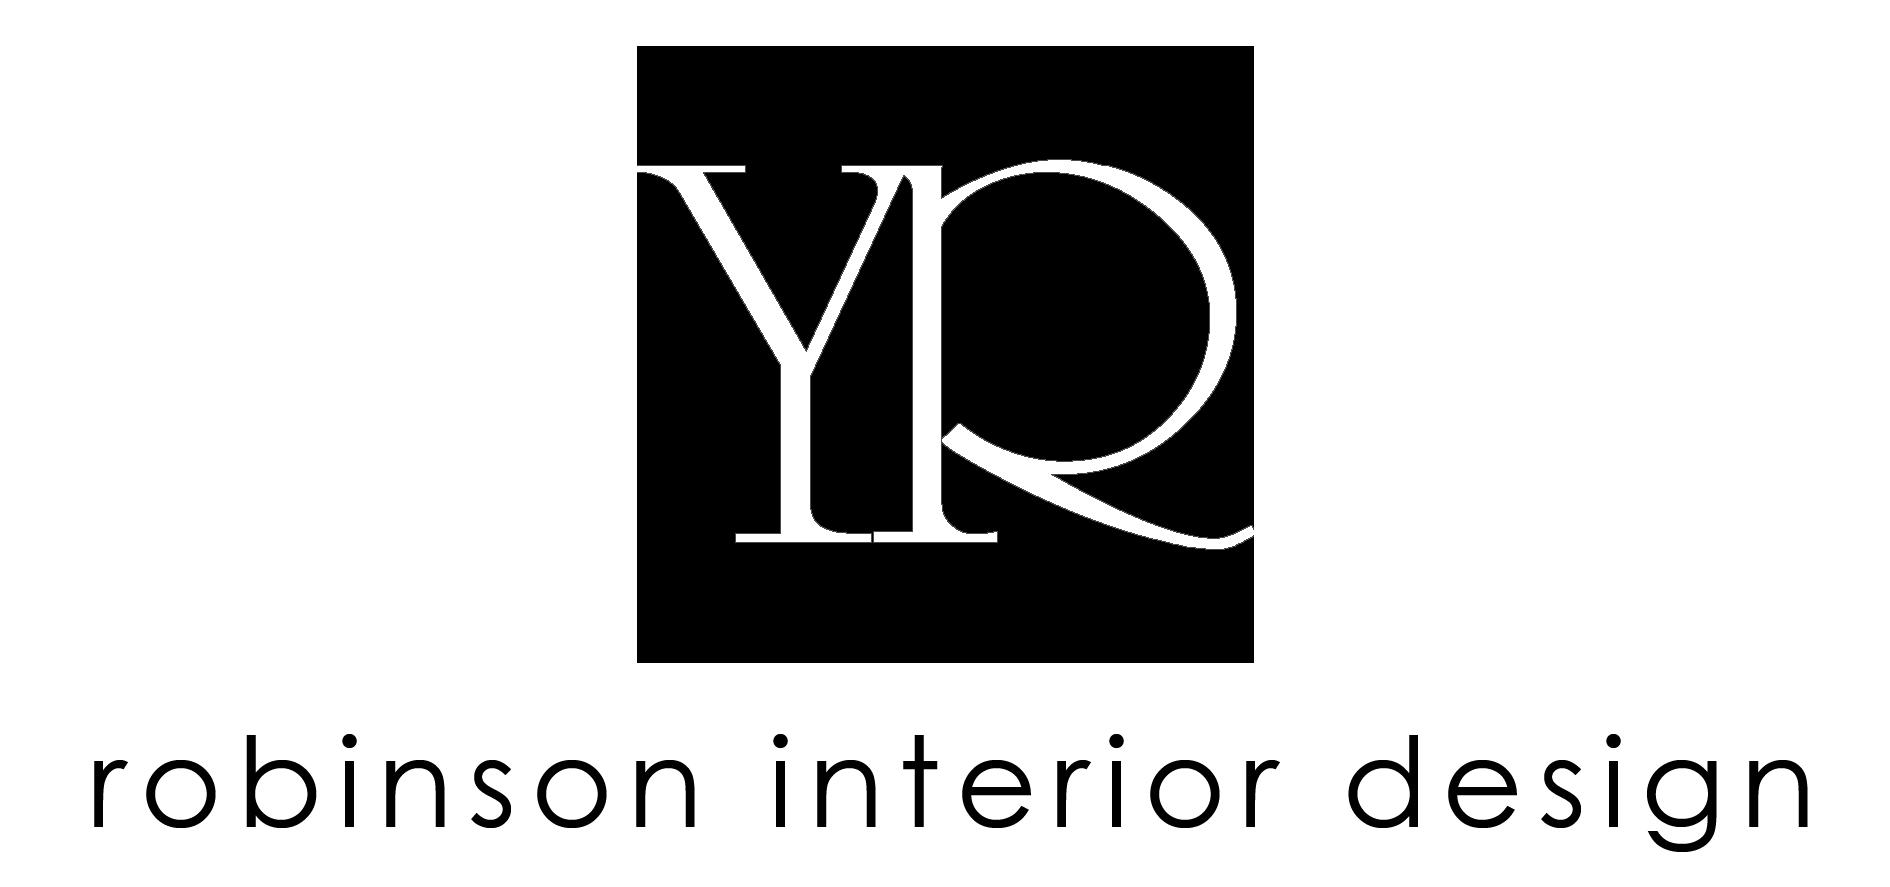 Interior designer home oakville - Robinson Interior Design Oakville On Interior Designers Decorators